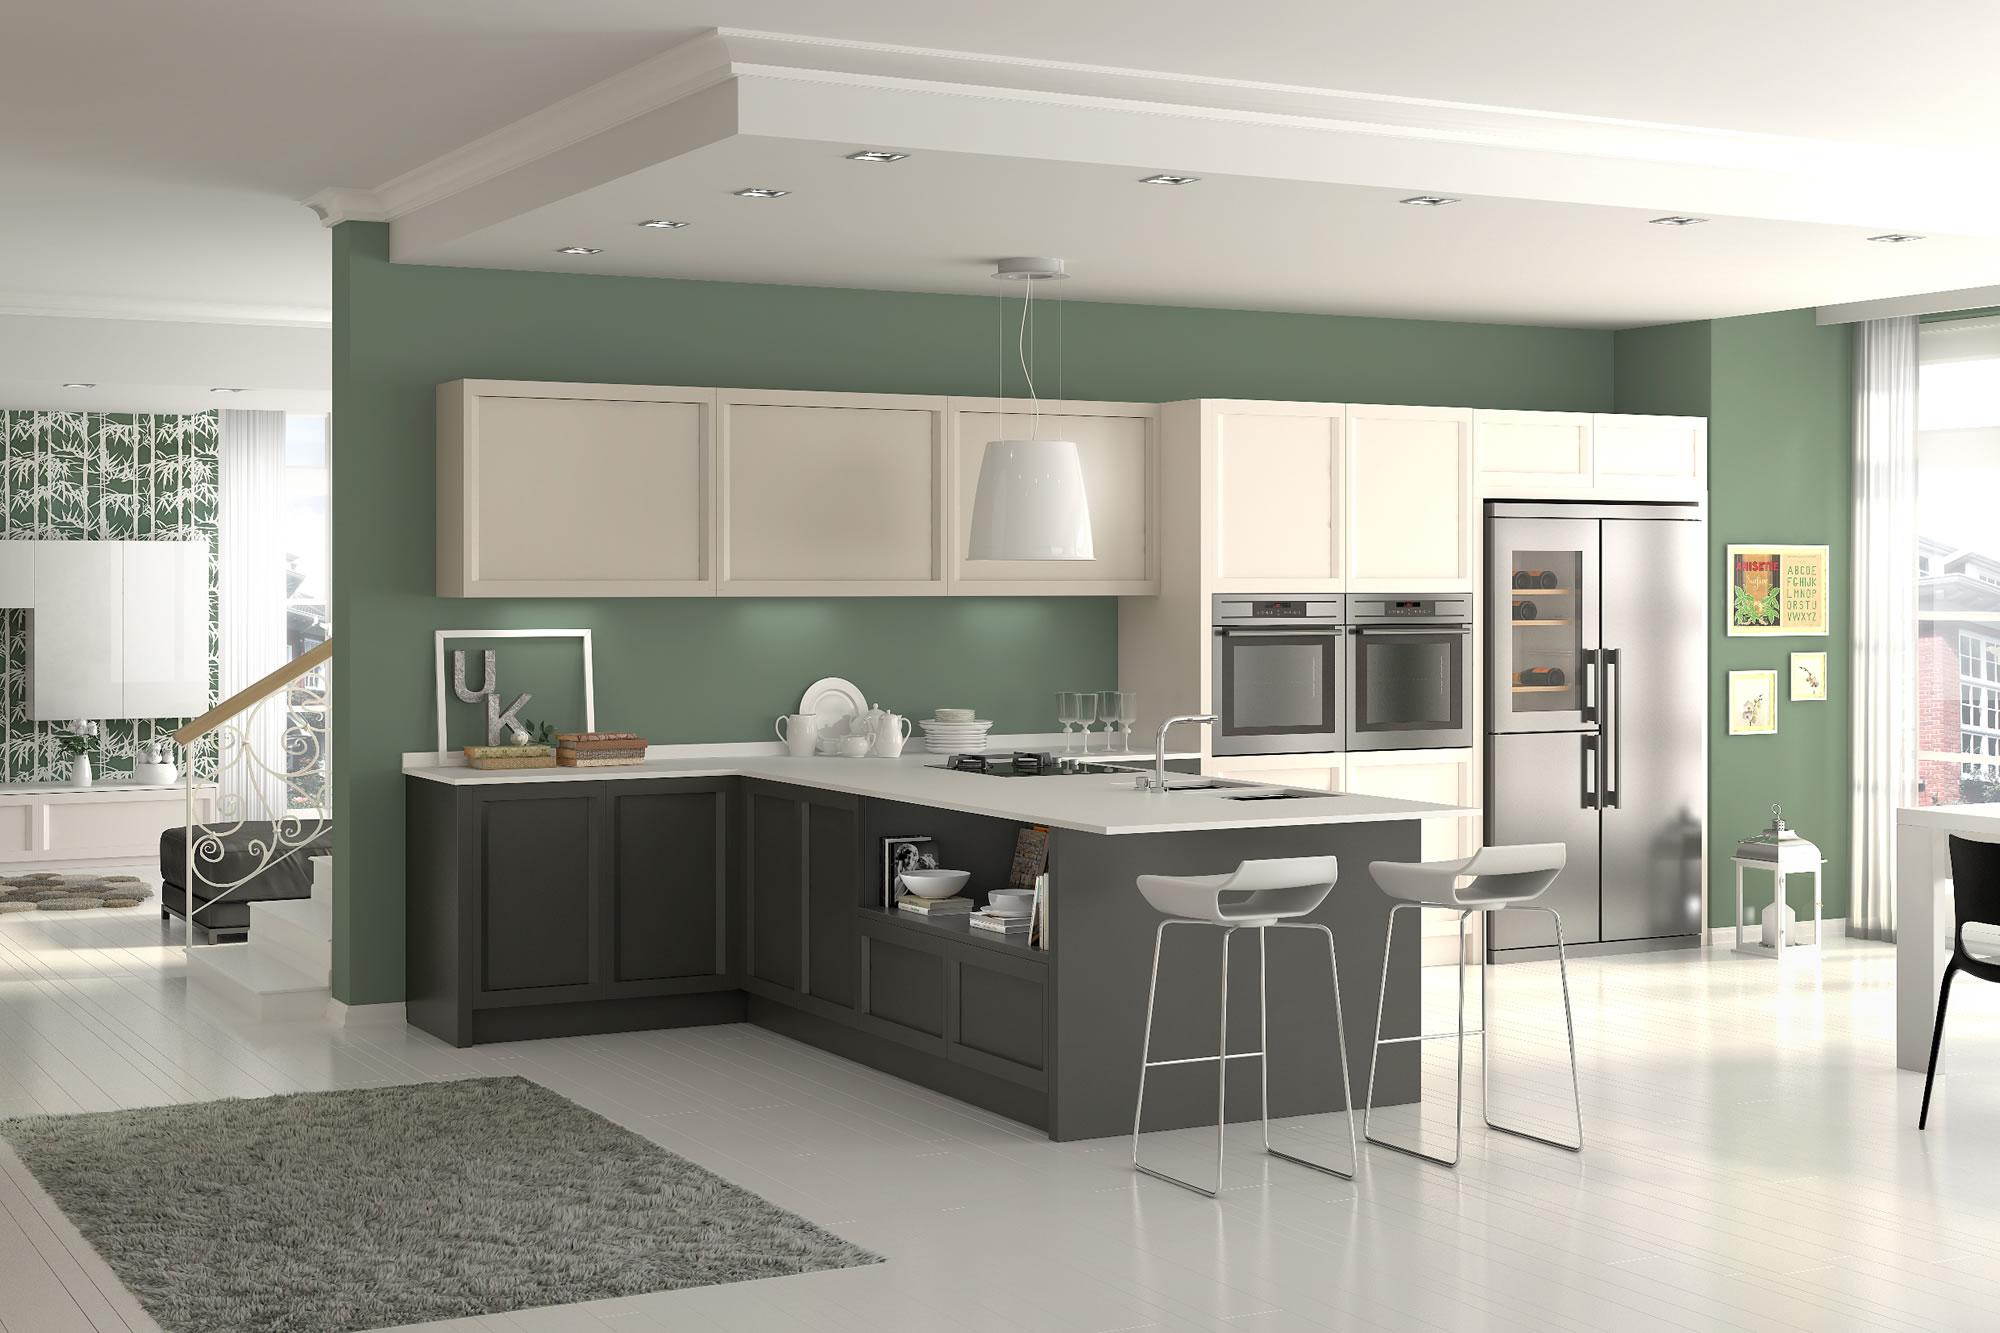 Cucine componibili design moderne eleganti ecologiche poggibonsi colle di val d 39 elsa - Immagini cucine moderne ...